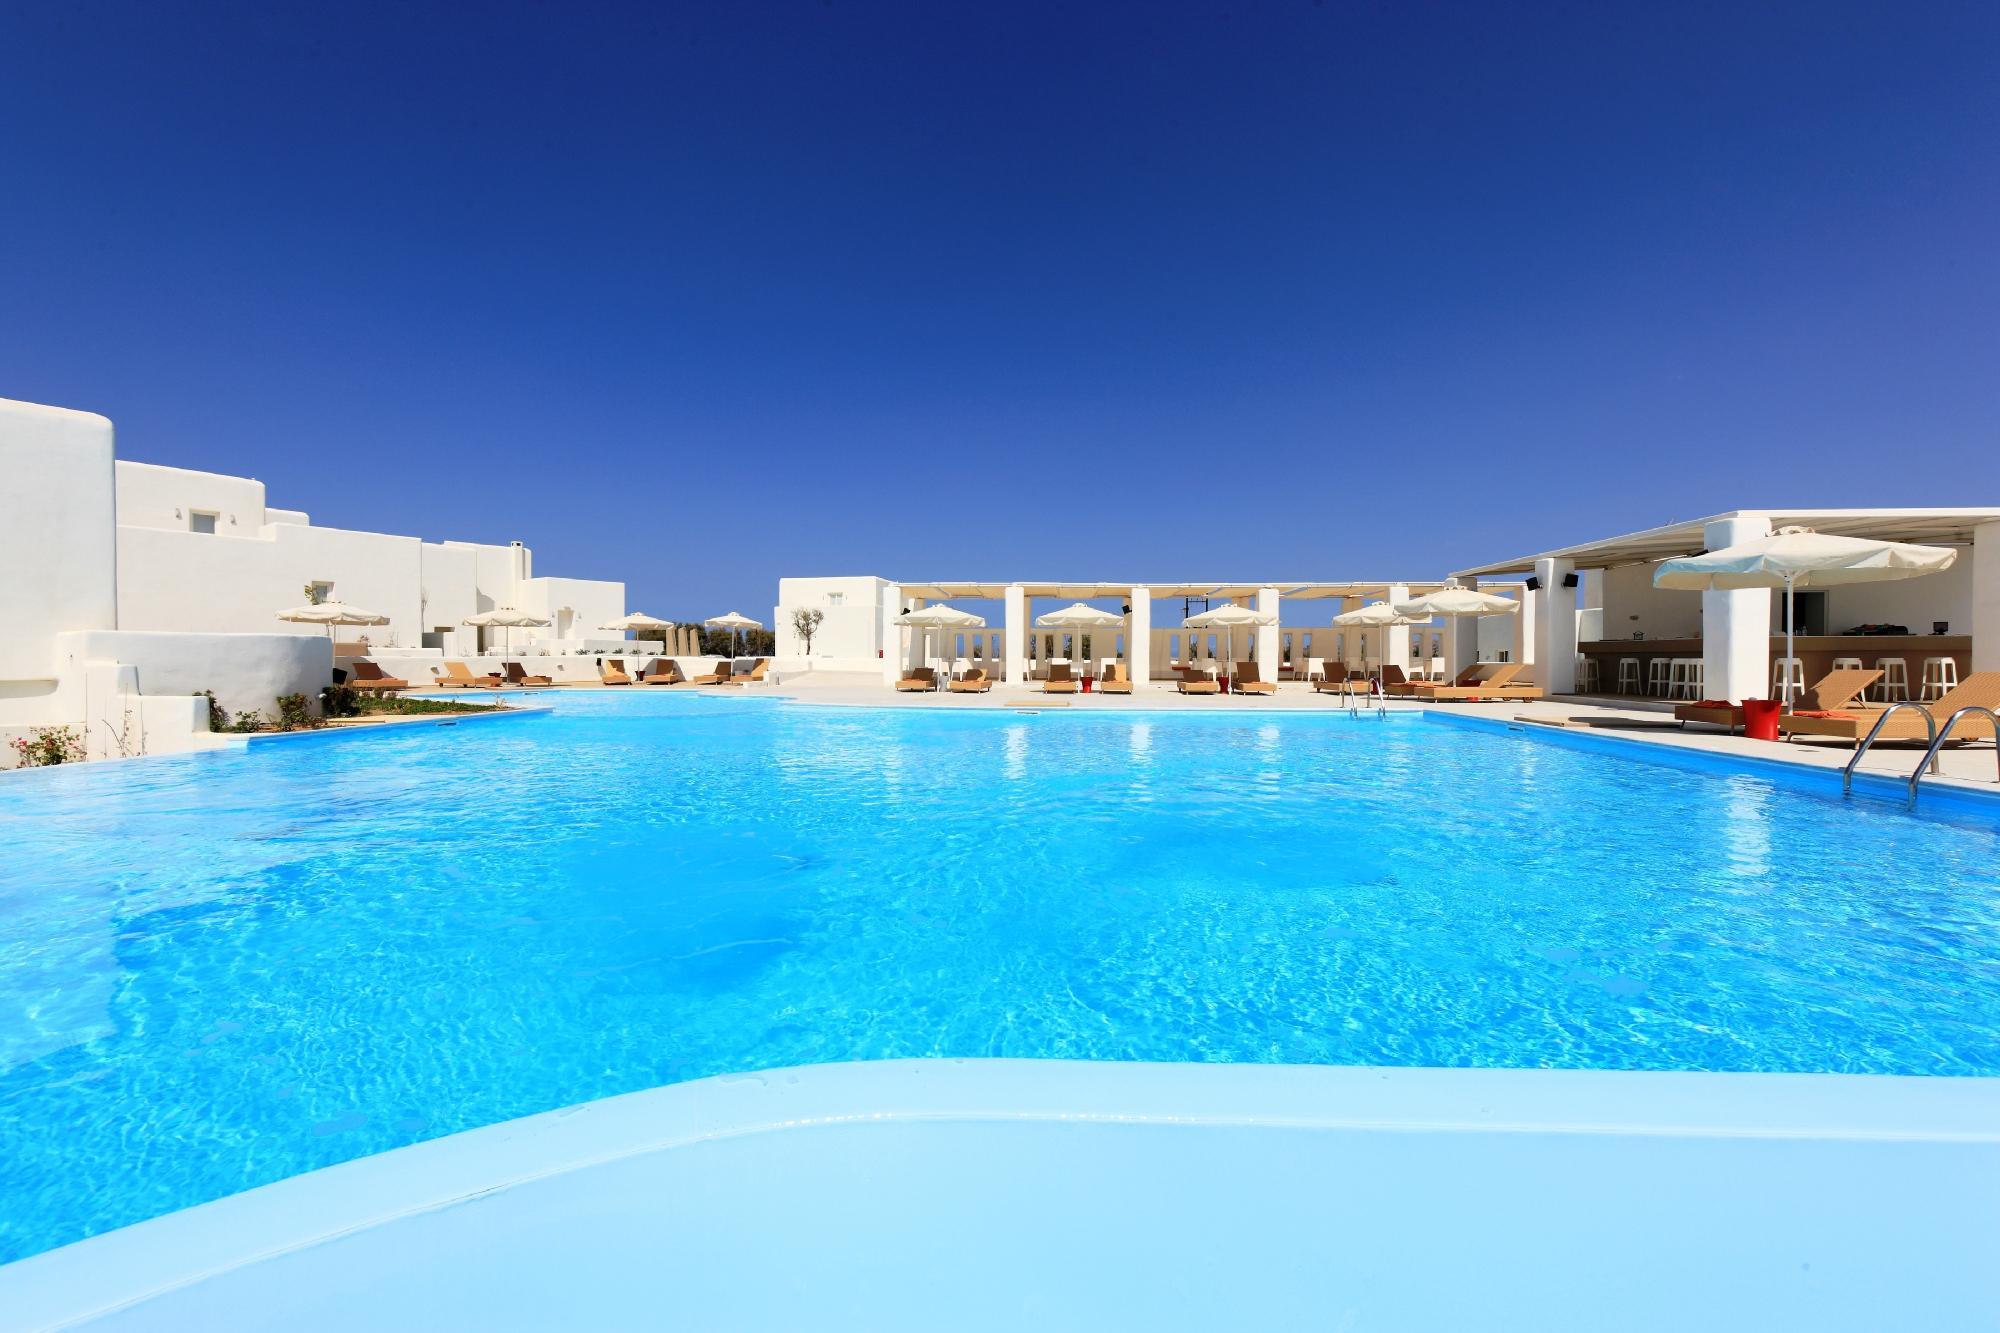 5 archipelagos resort agia irini paros ccbs greece for Boutique hotel paros